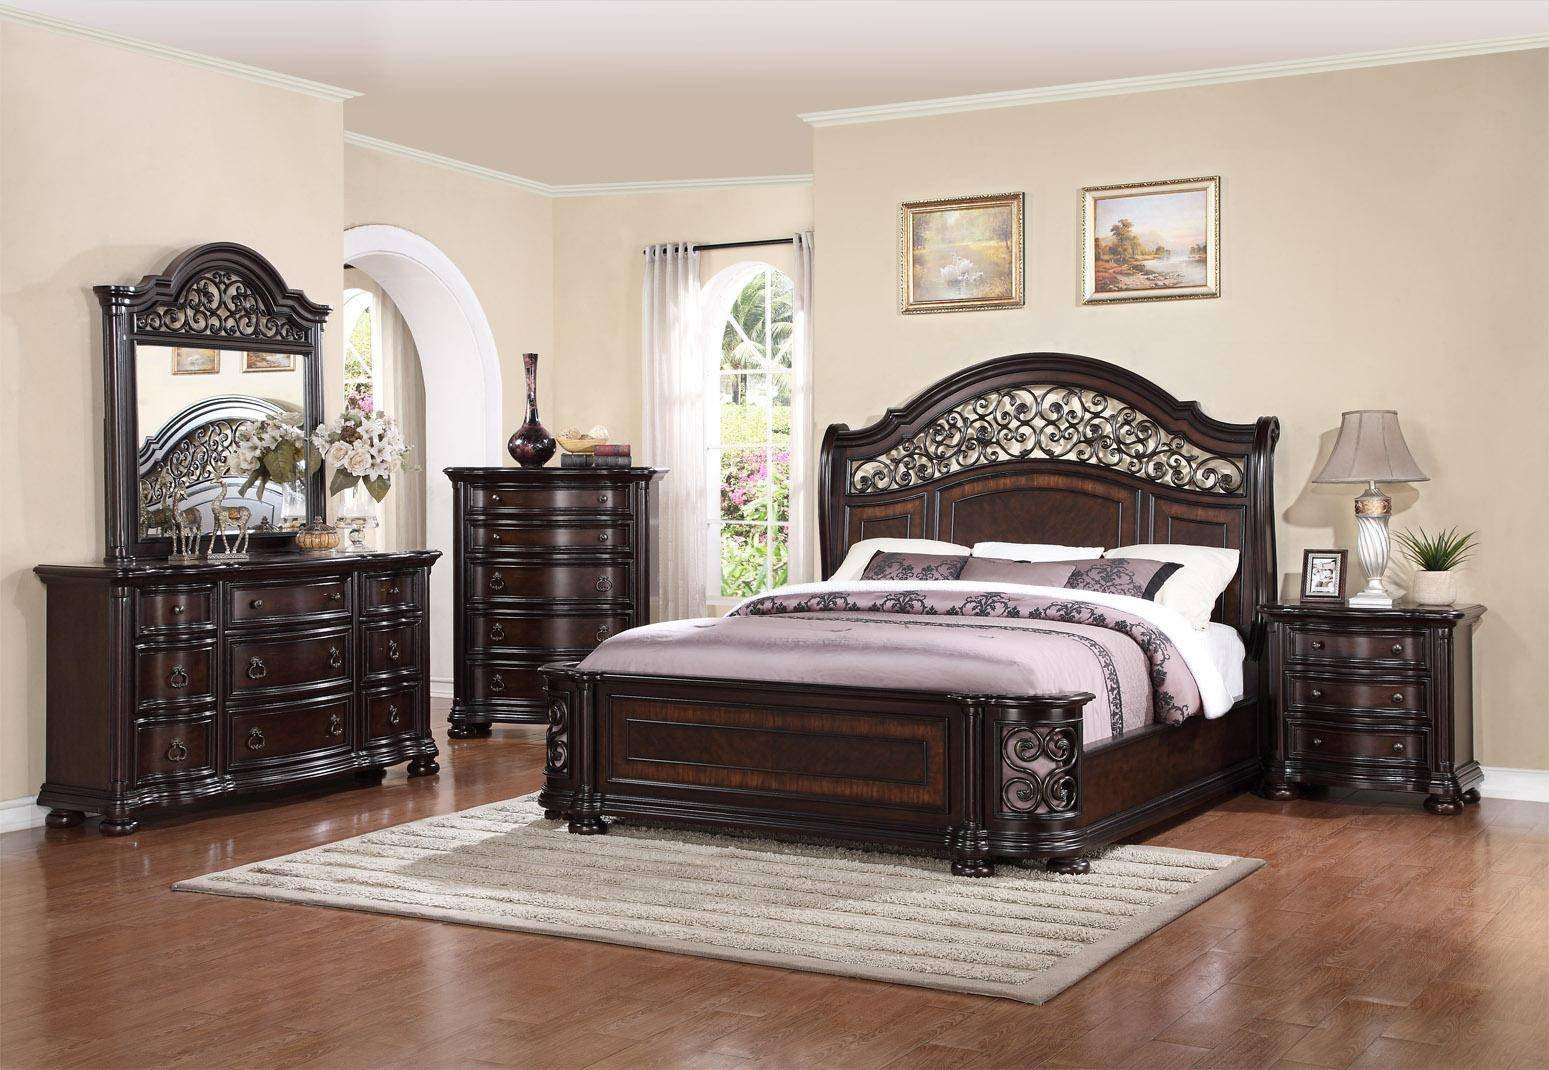 California King Bedroom Set Beautiful Mcferran B366 Allison Espresso Finish solid Hardwood